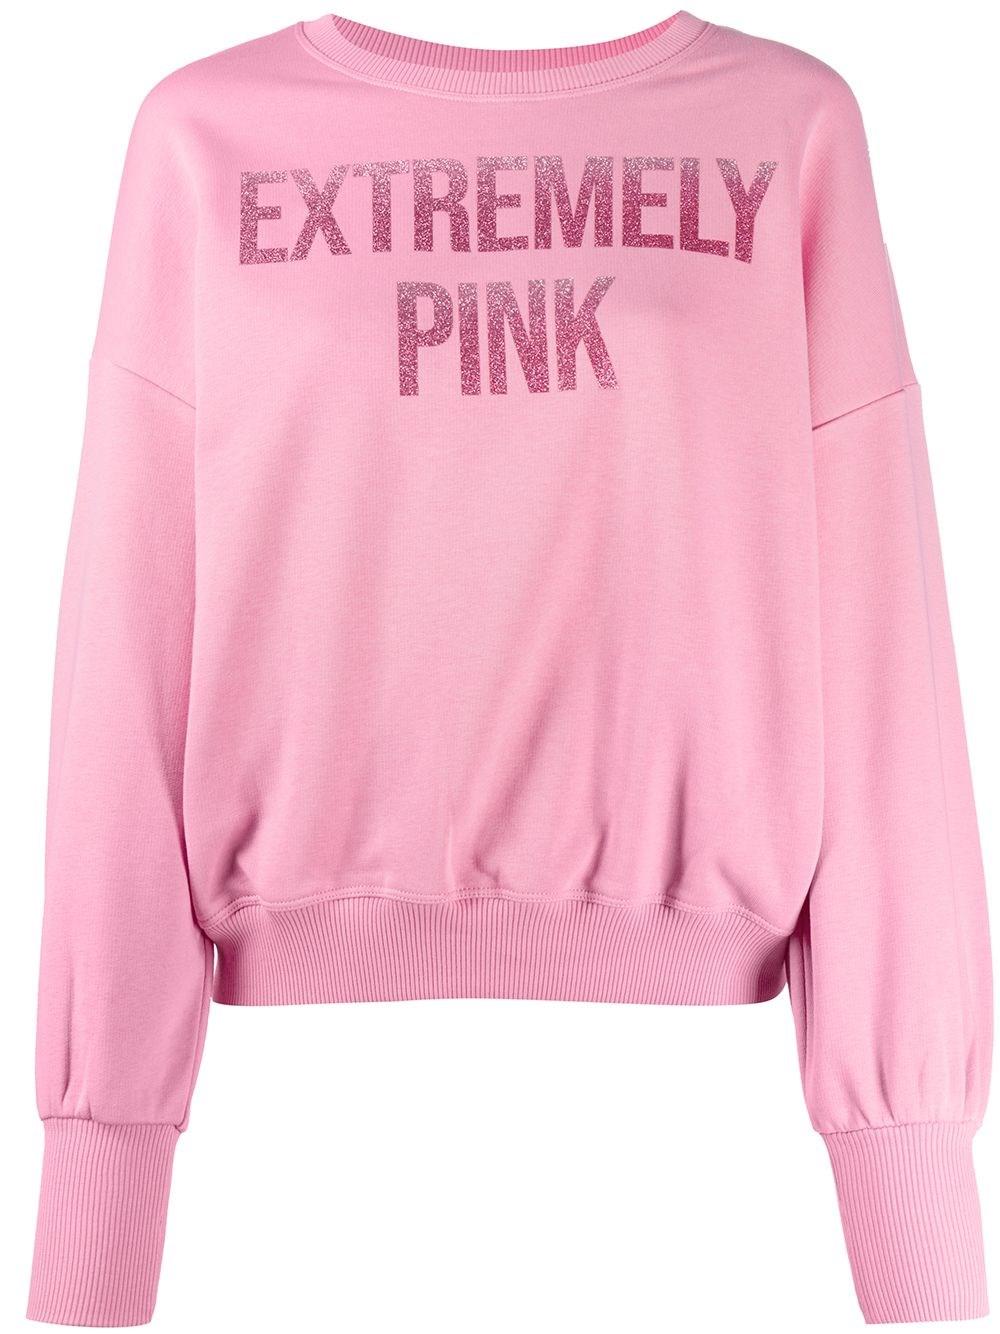 "REDVALENTINO ""Extremely Pink"" Sweatshirt"